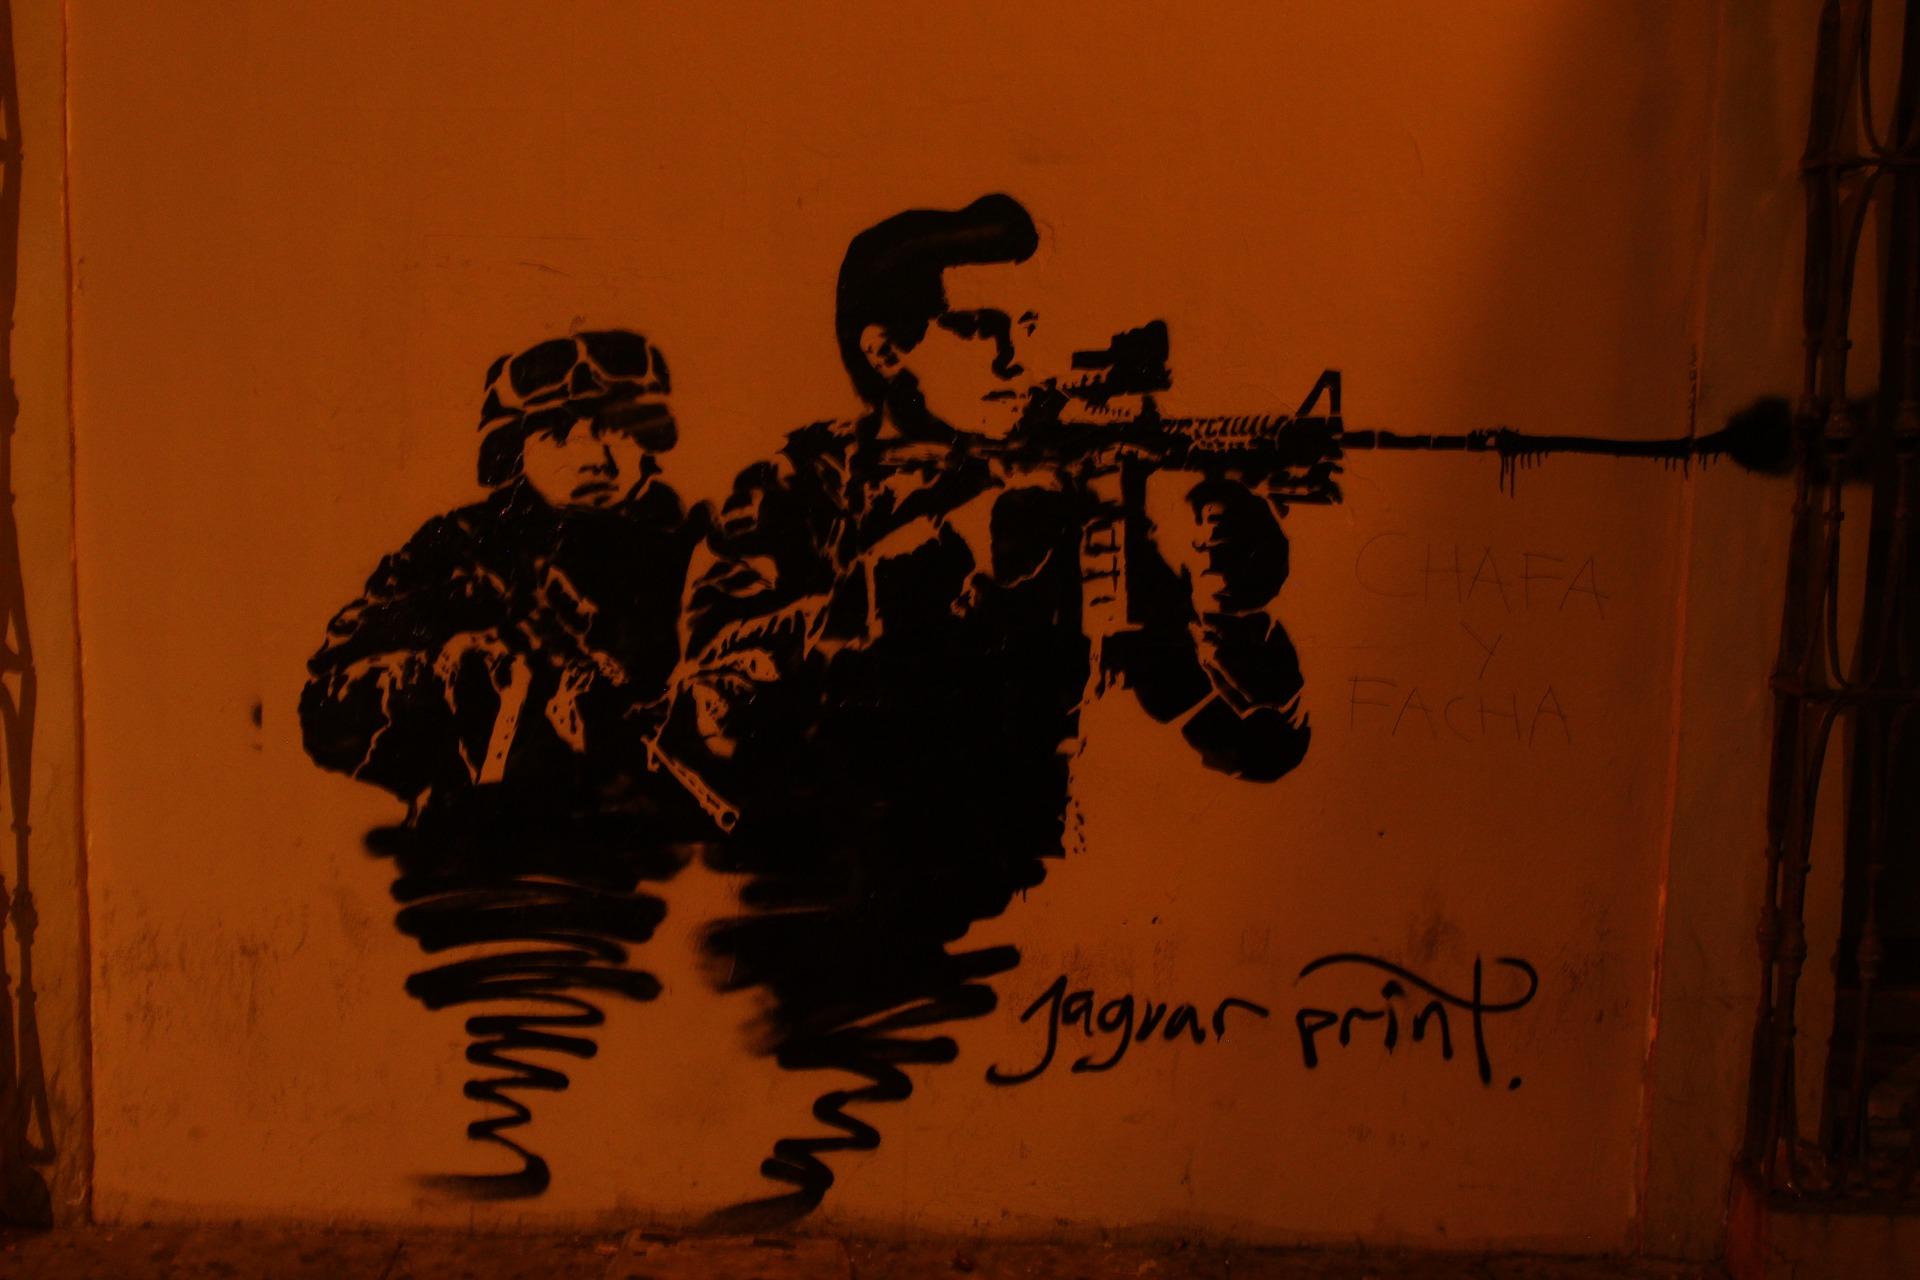 An urban street art mural in Oaxaca